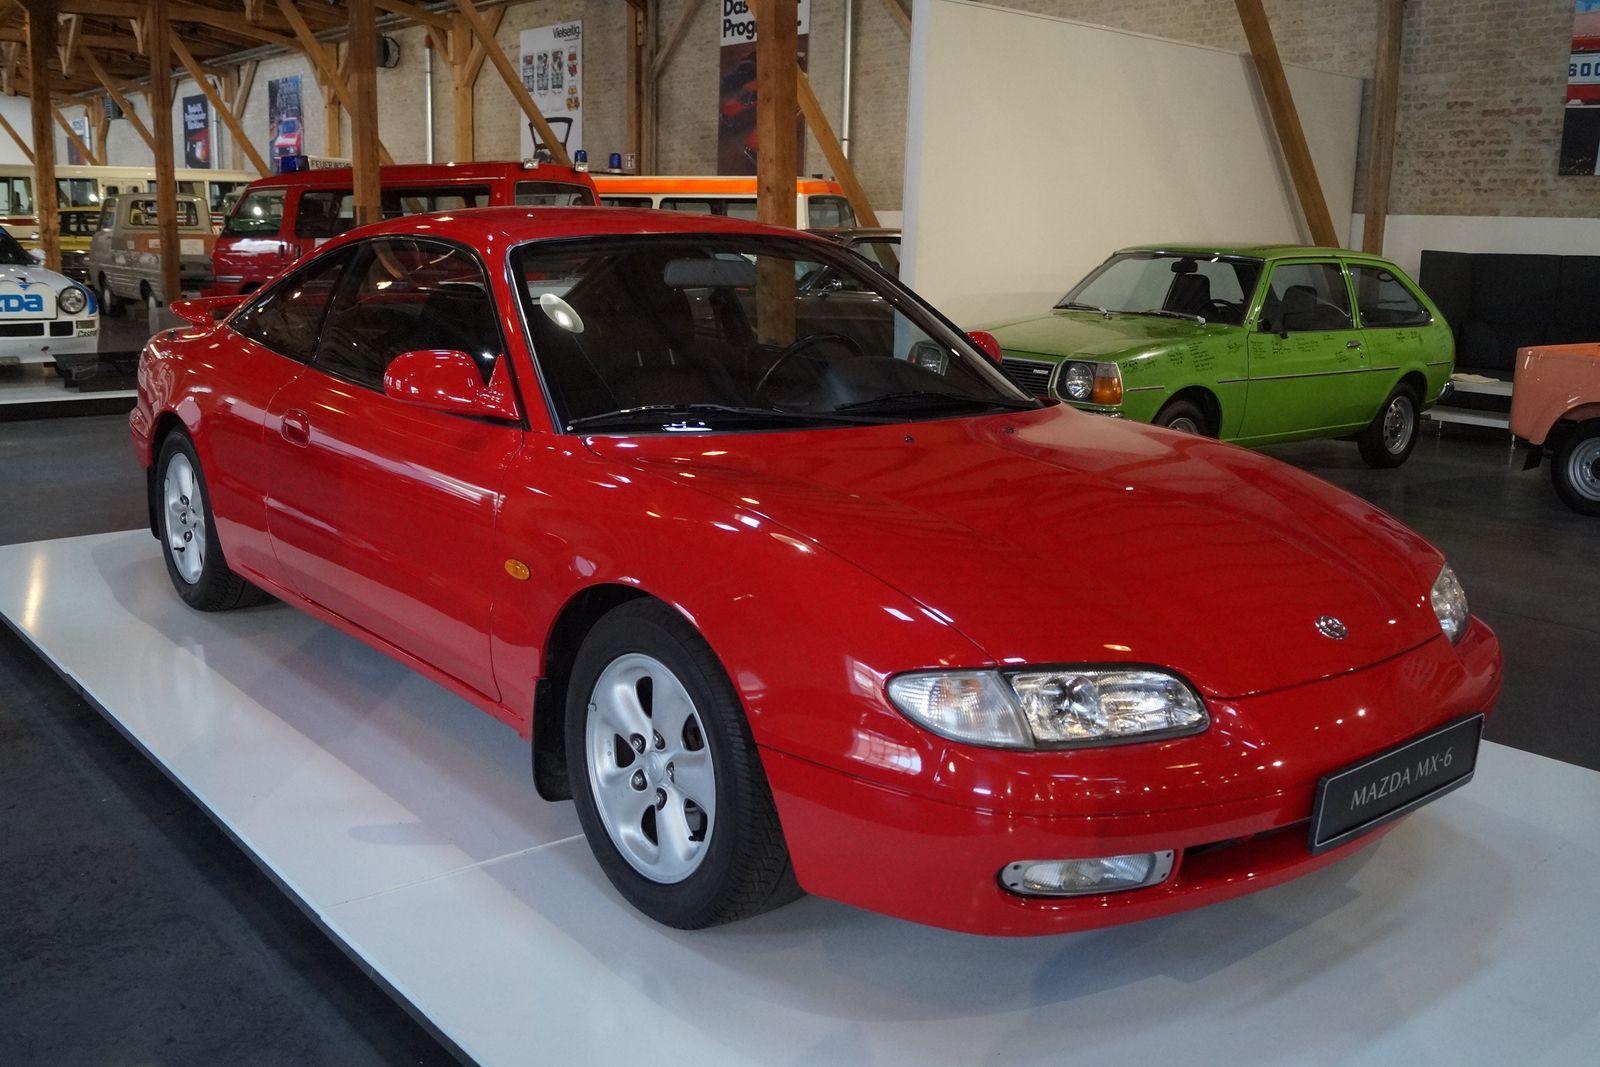 100 Jahre Mazda - XM 6